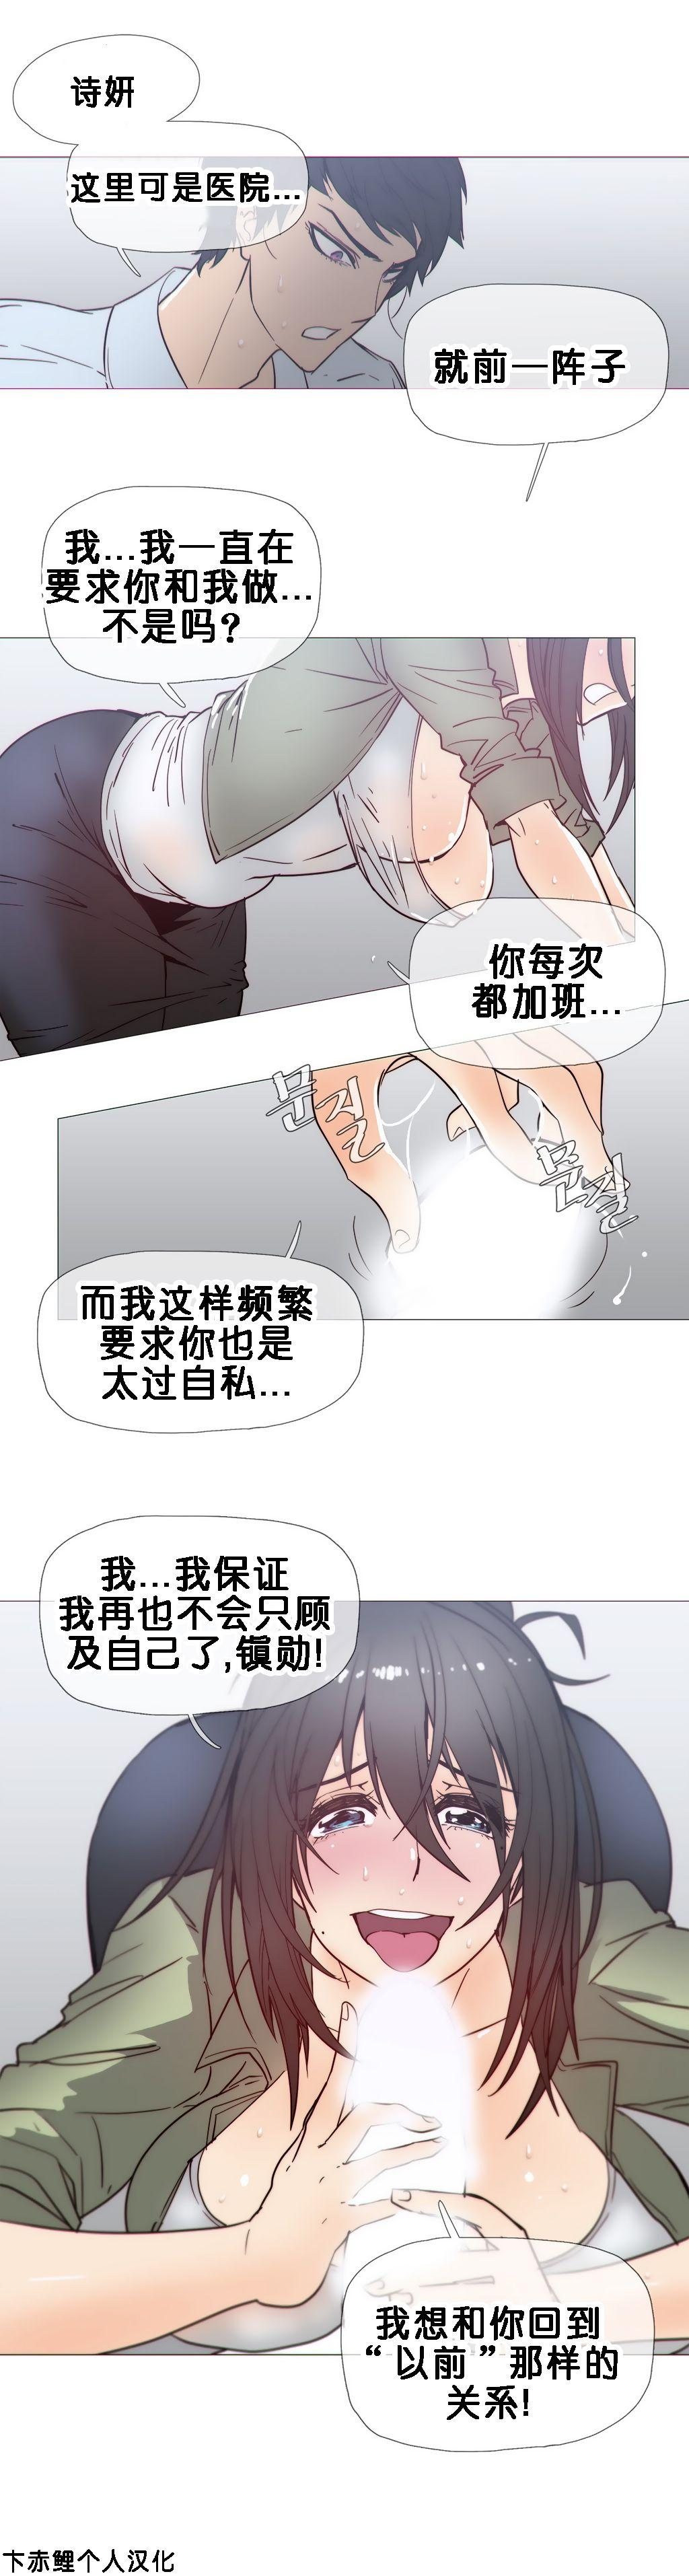 HouseHold Affairs 【卞赤鲤个人汉化】1~33话(持续更新中) 512